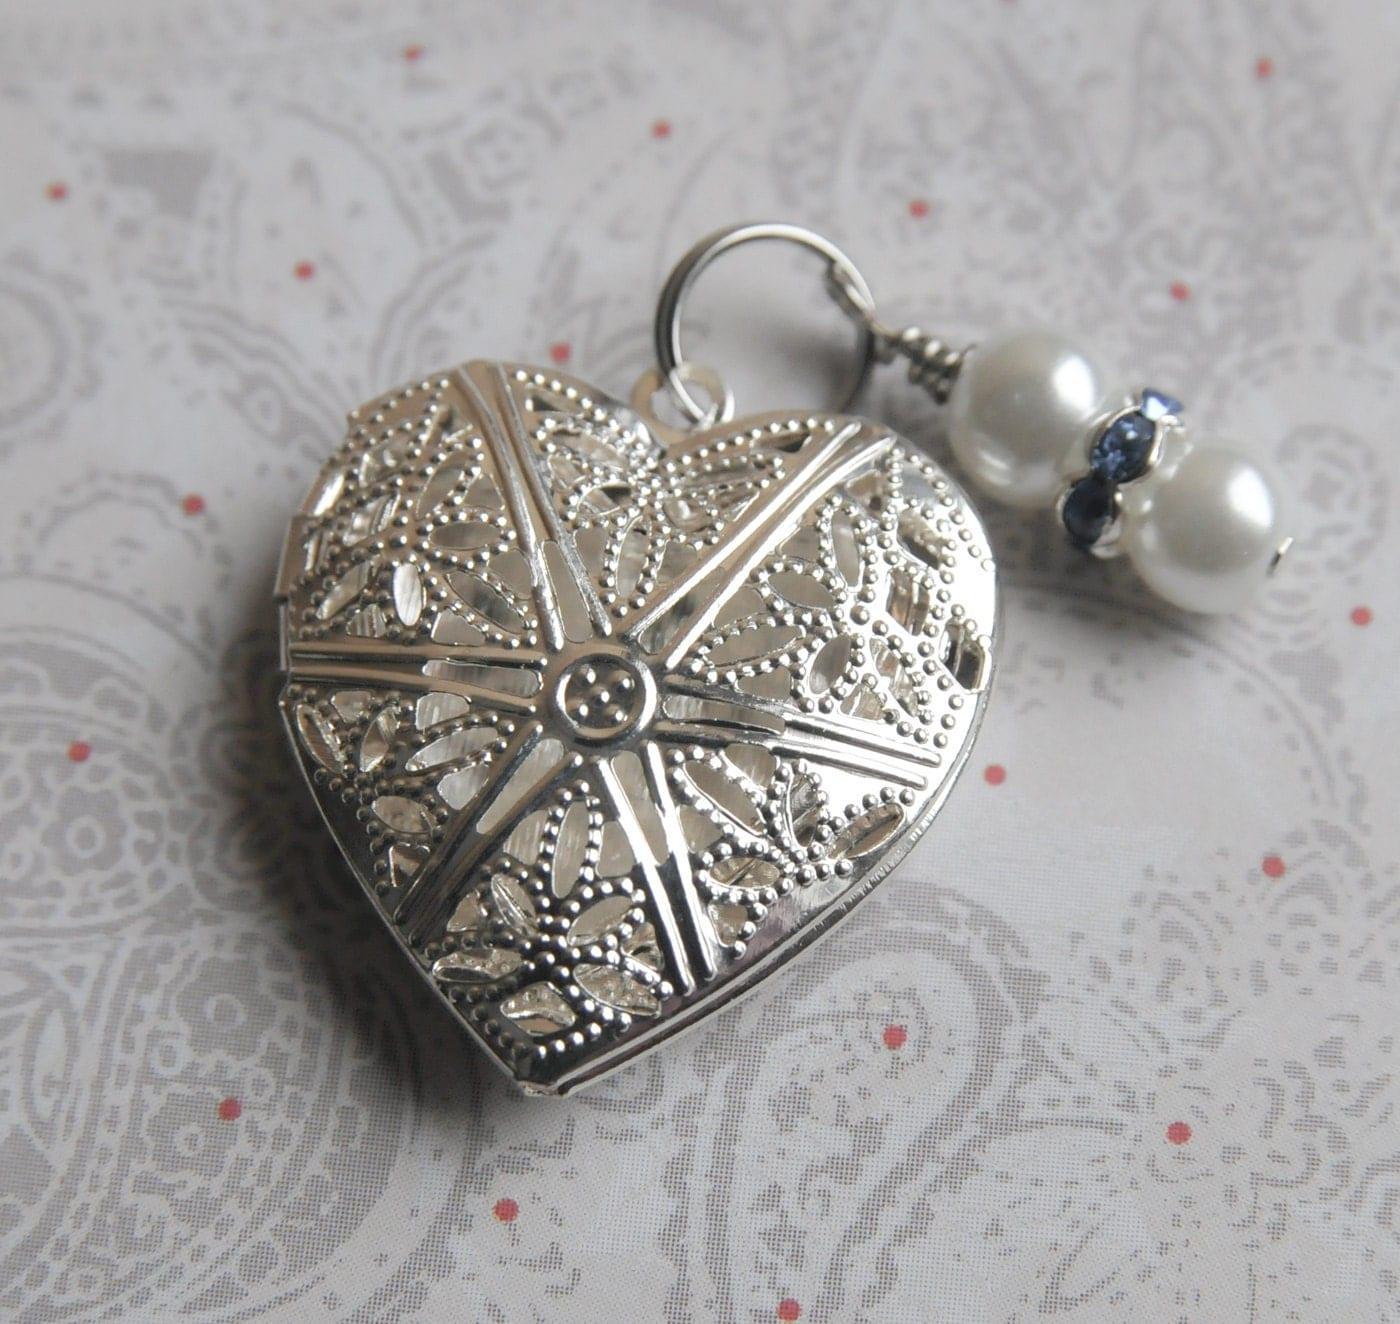 Bridal Bouquet Locket Charm : Something blue bouquet charm heart locket wedding